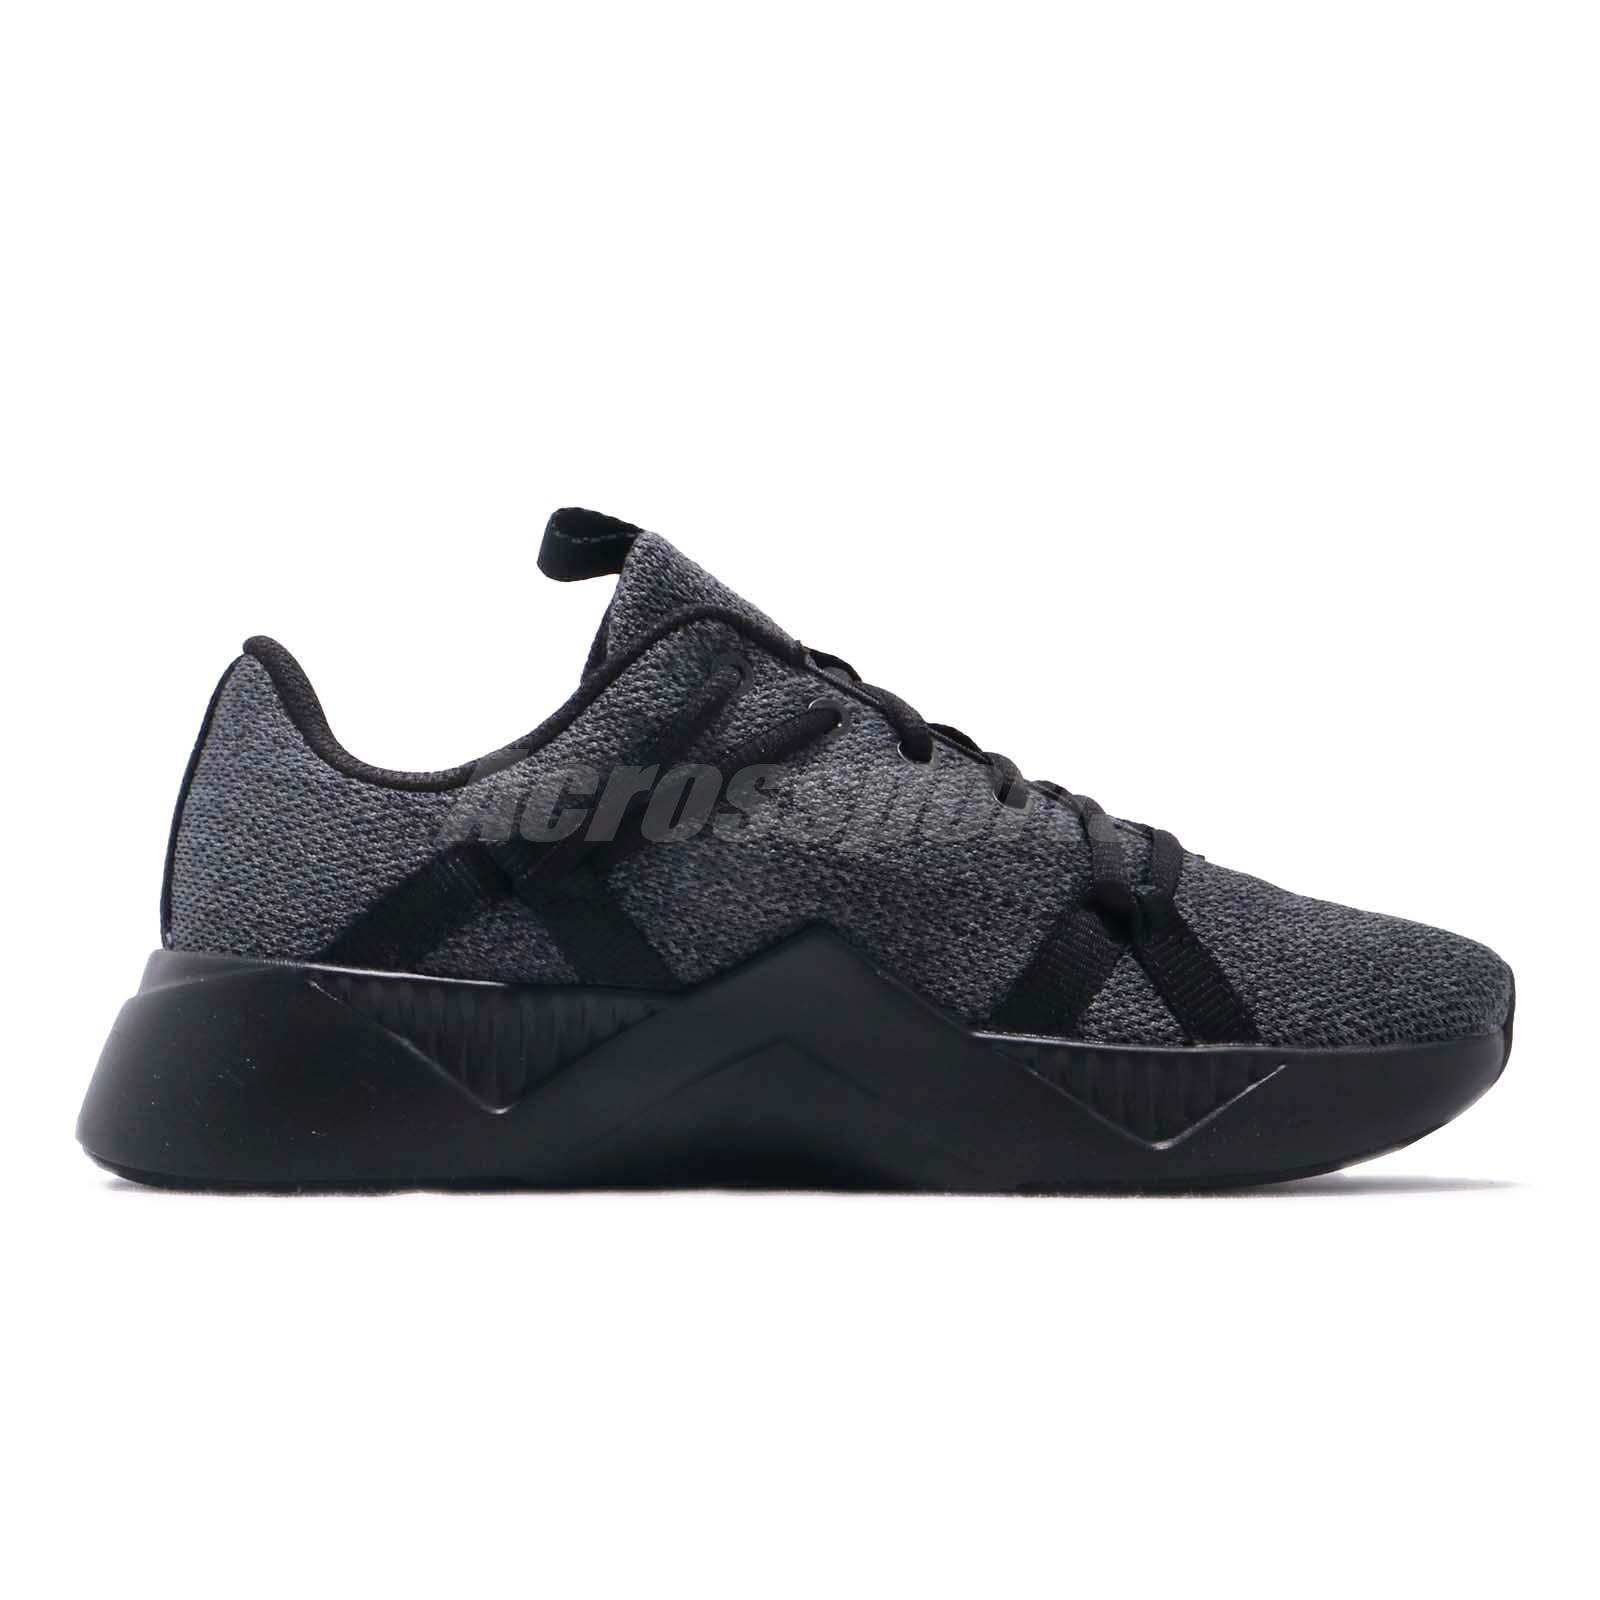 3619567b4544e Puma Incite Knit Wns Black White Women Running Casual Shoes Sneakers ...